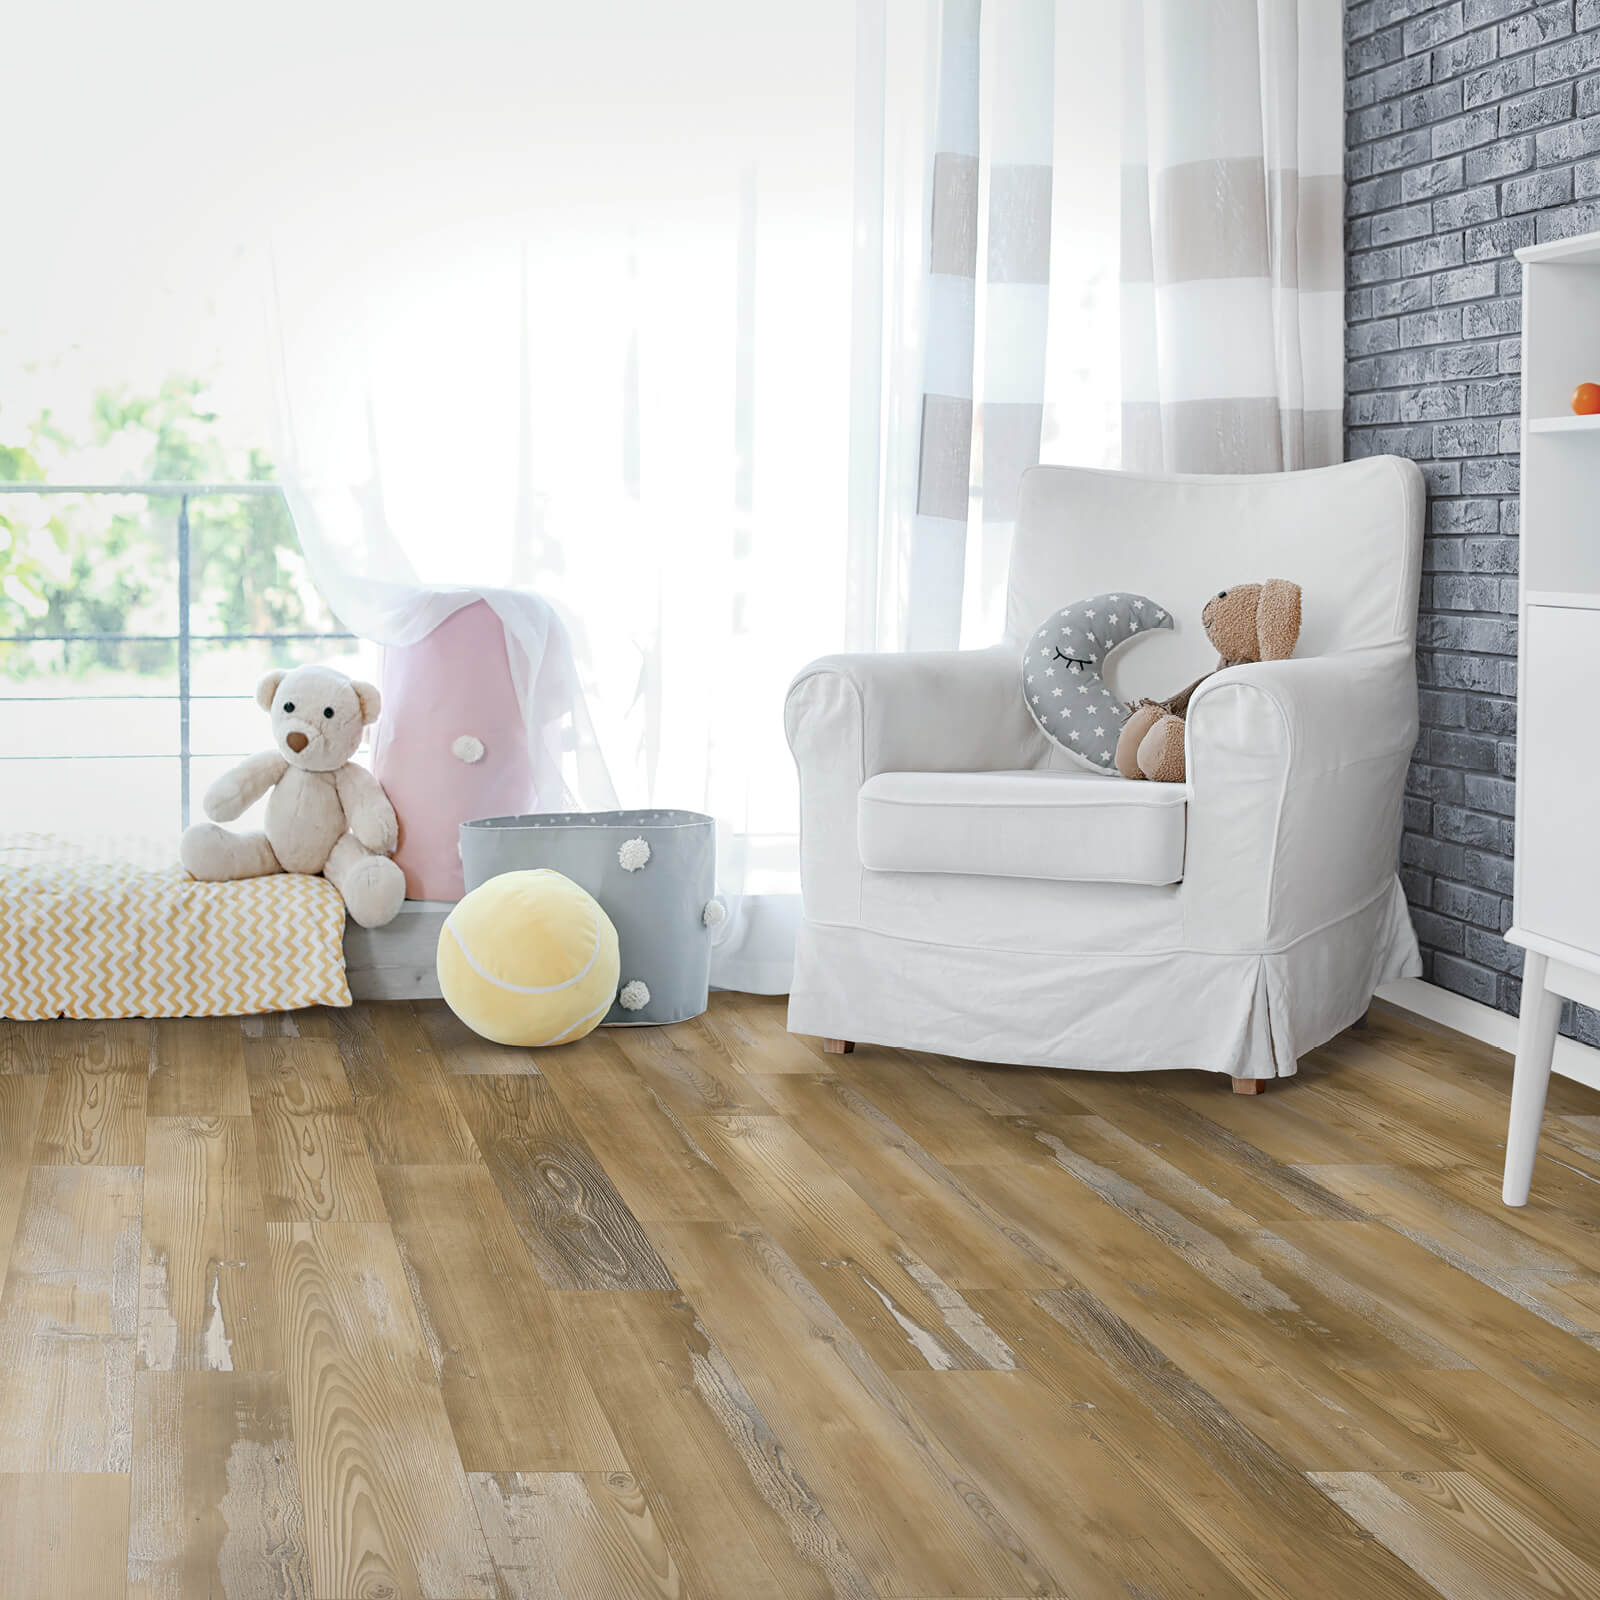 Lamiante Gallery Flooring Inspiration, Laminate Flooring Sarasota Fl